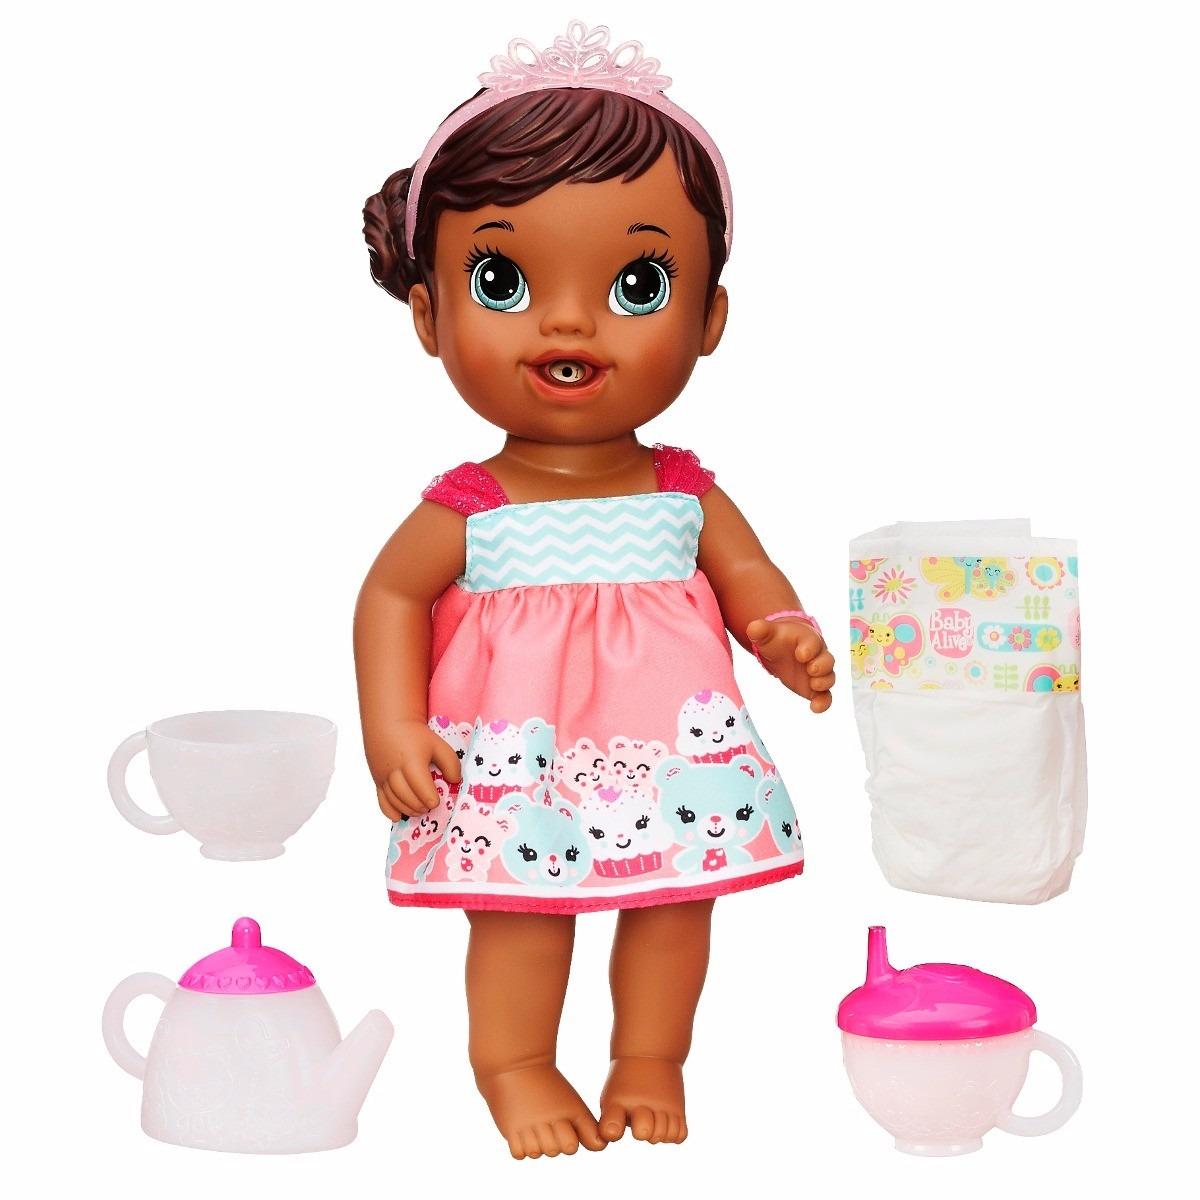 Boneca Baby Alive Negra Hora Do Ch 225 Hasbro Pronta Entrega